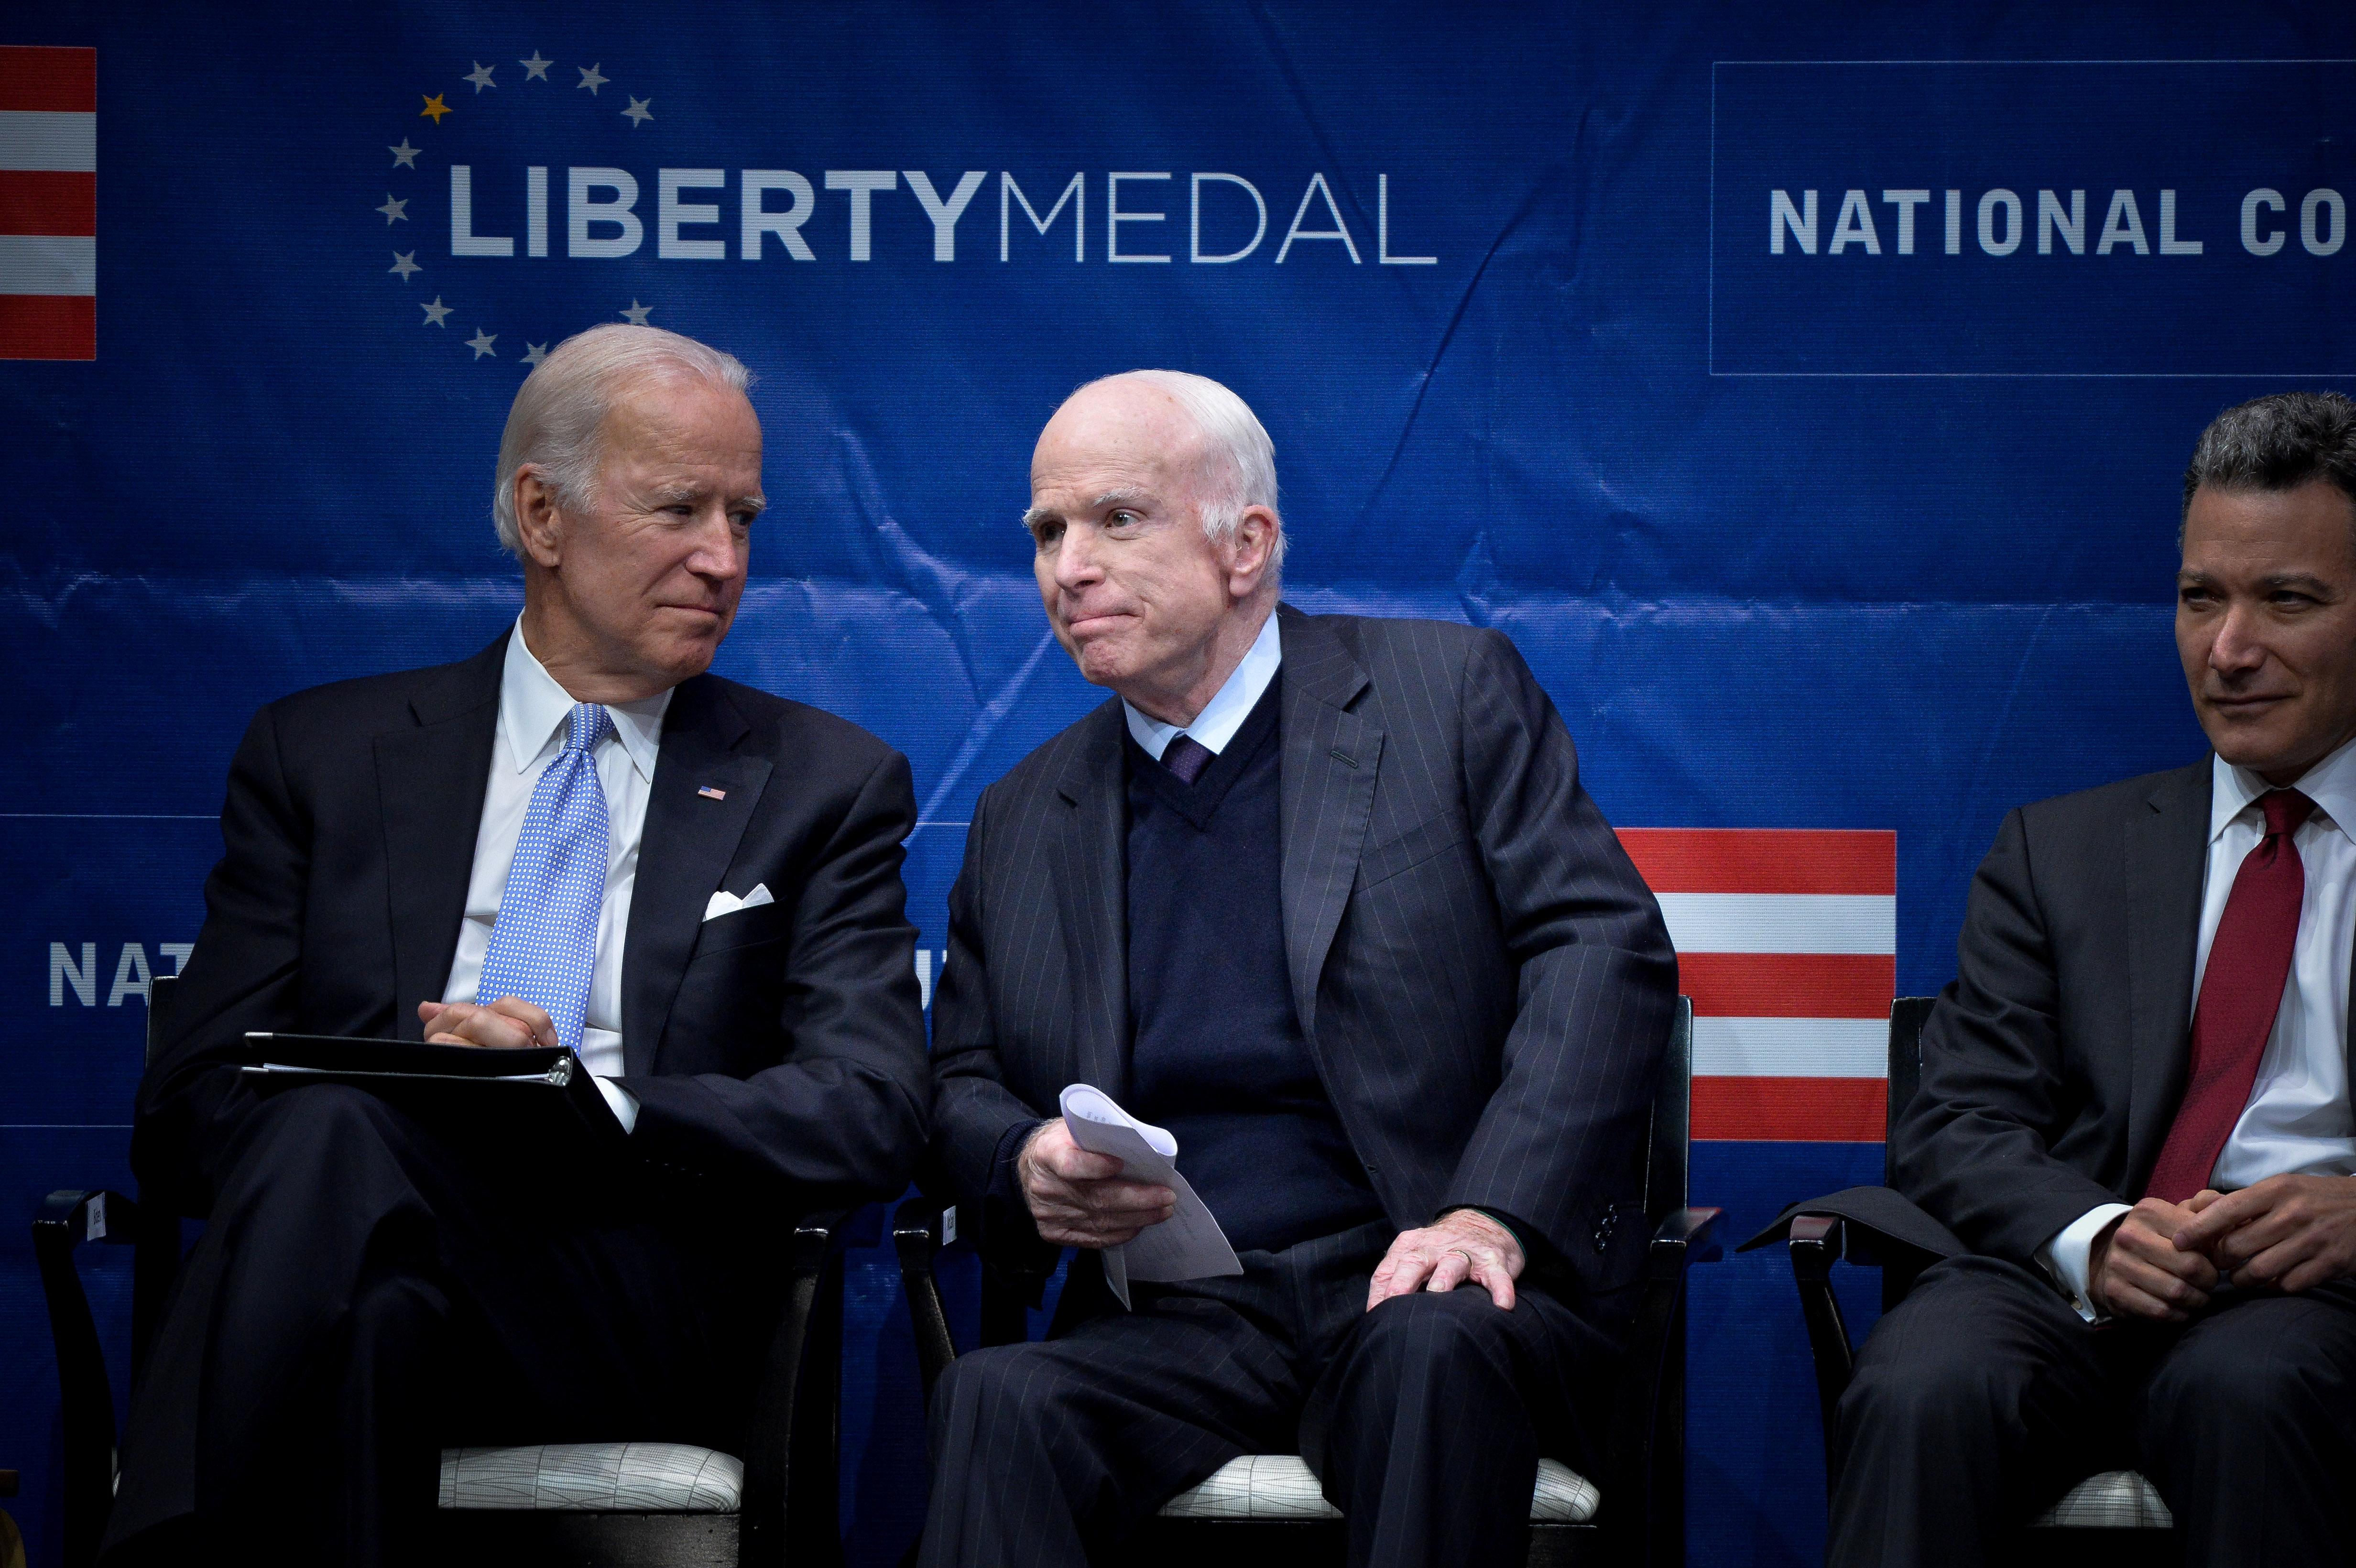 Here's Who Will Serve As Pallbearers At John McCain's Washington